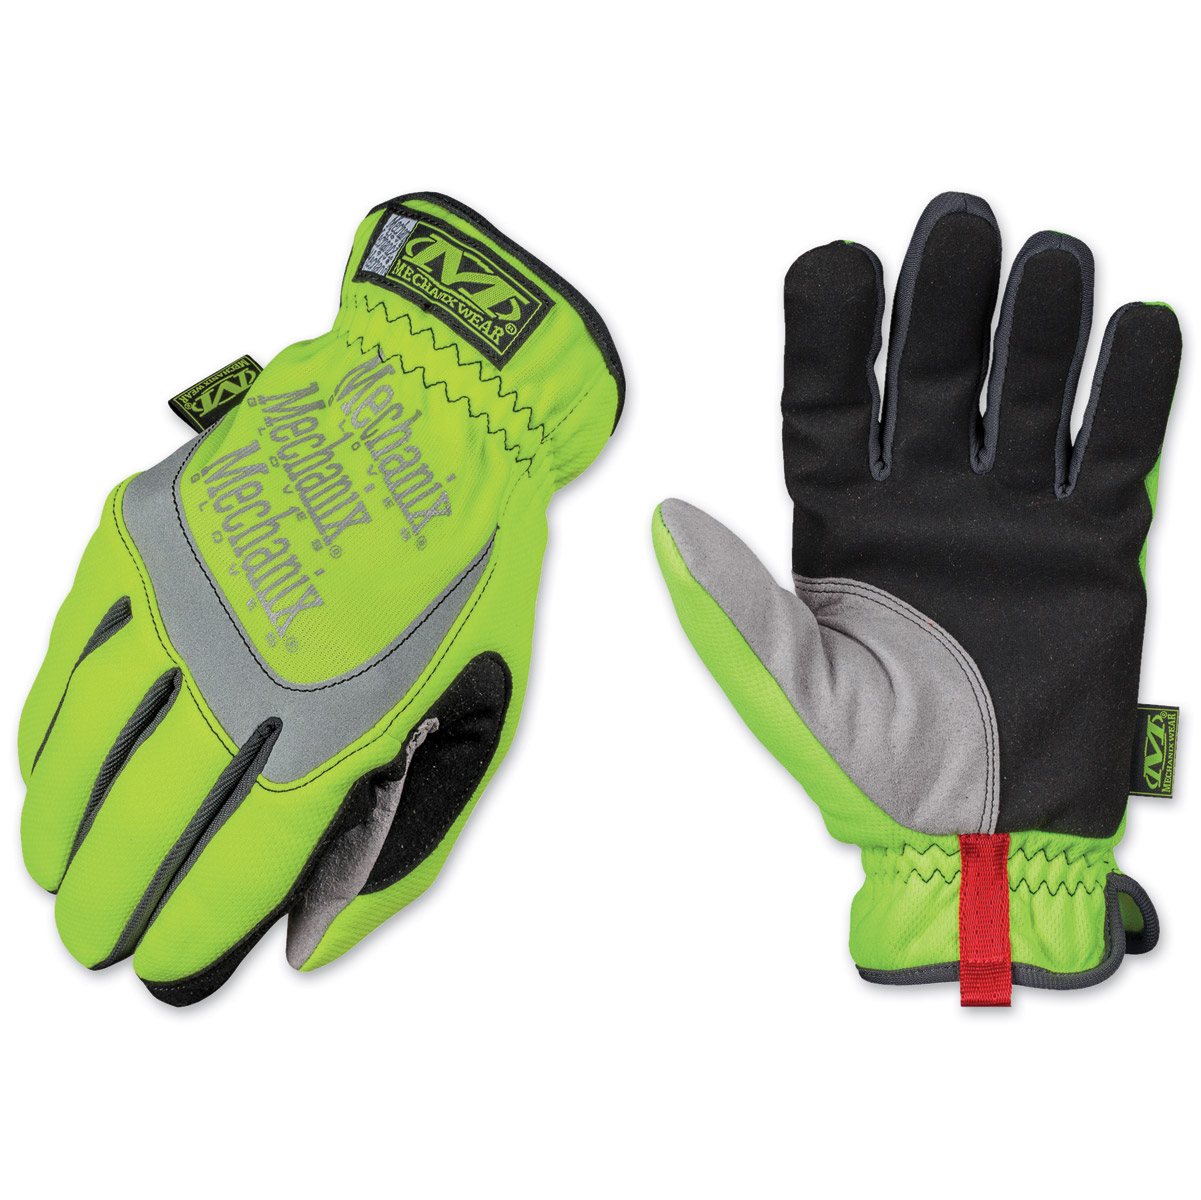 Mechanix Wear Original Hi-Viz Yellow Gloves